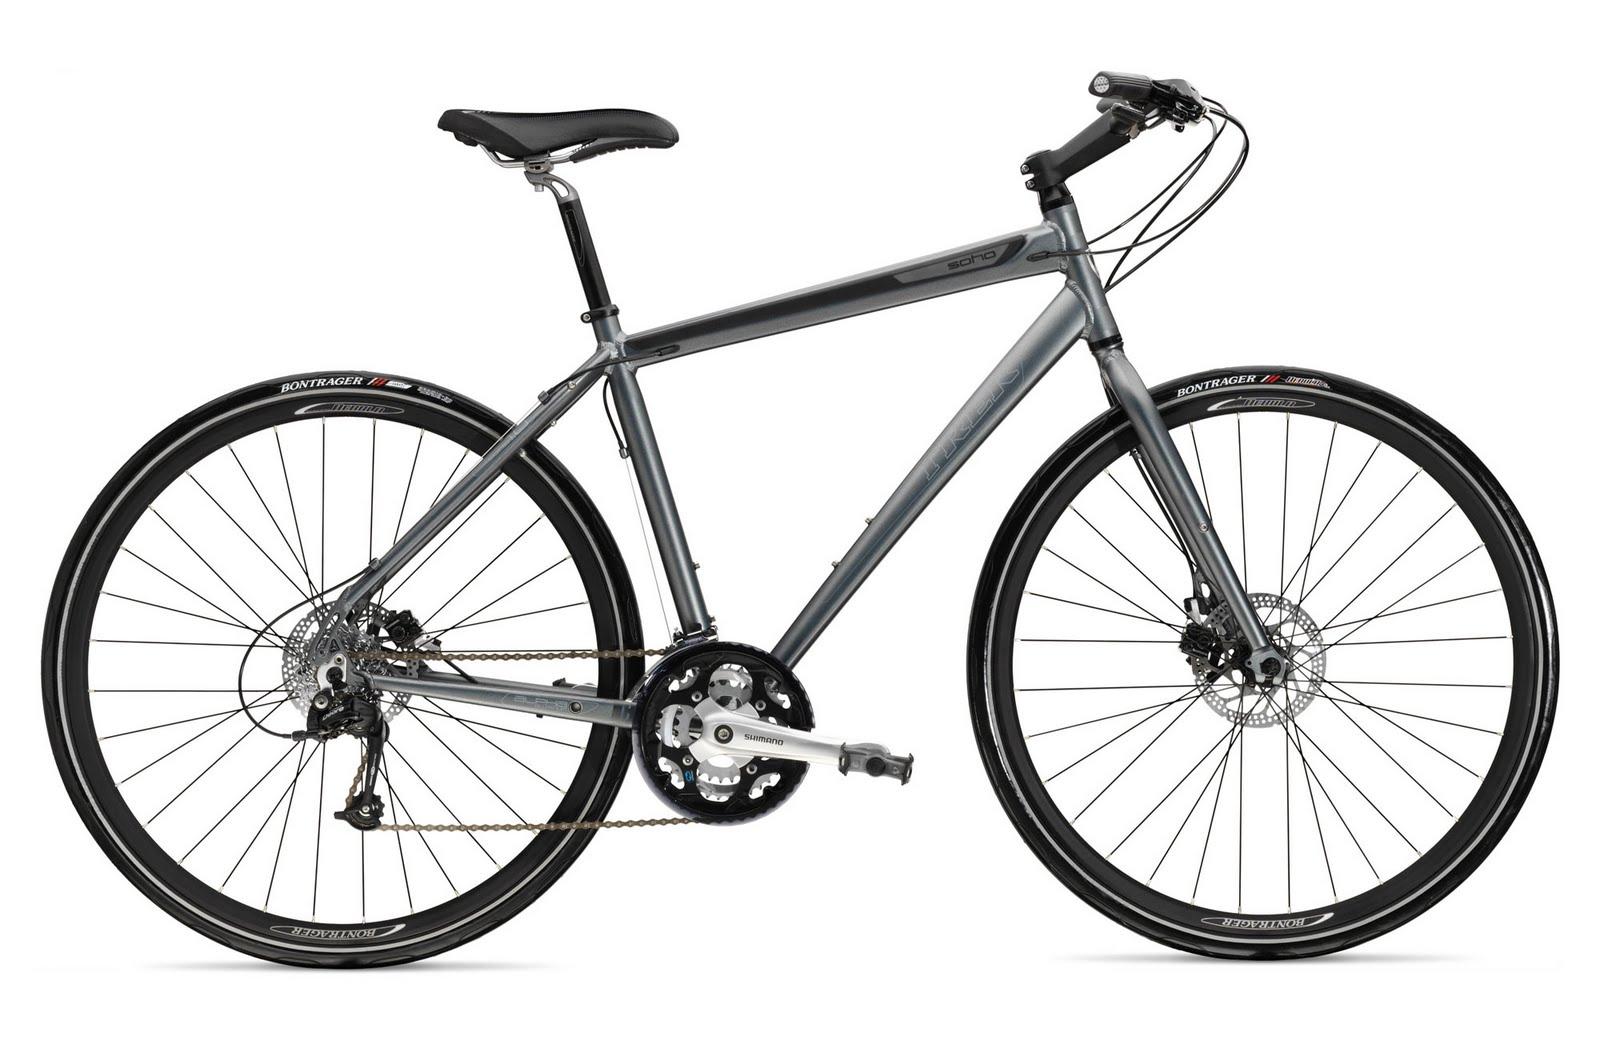 Ni Bicicleta Ni Bicicleto: La Bicicleta Moderna: Tipos De Bicicleta